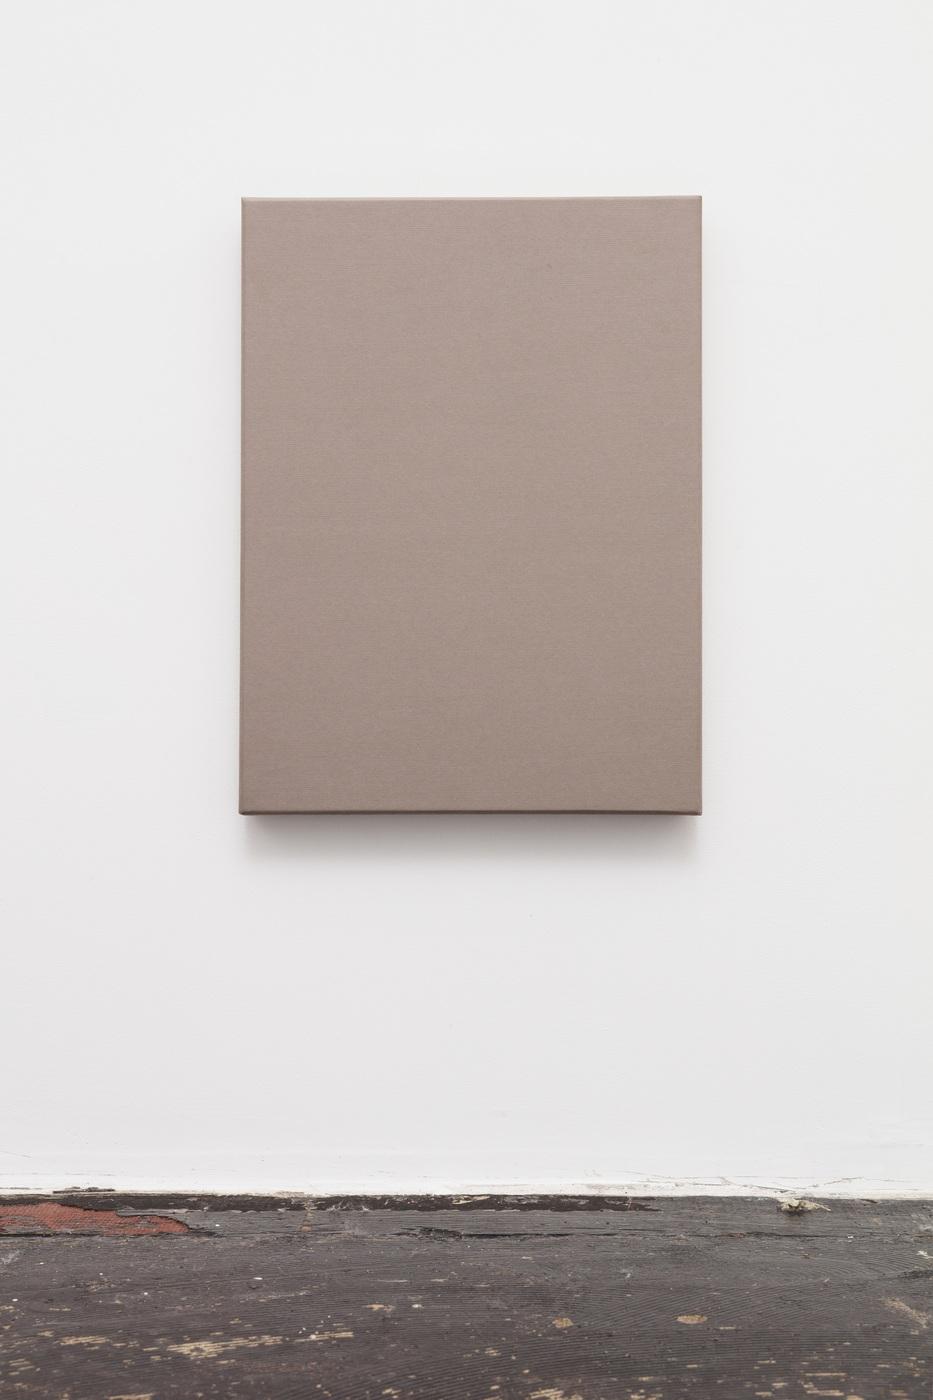 Jesse Stecklow, Collage Trap 1-2